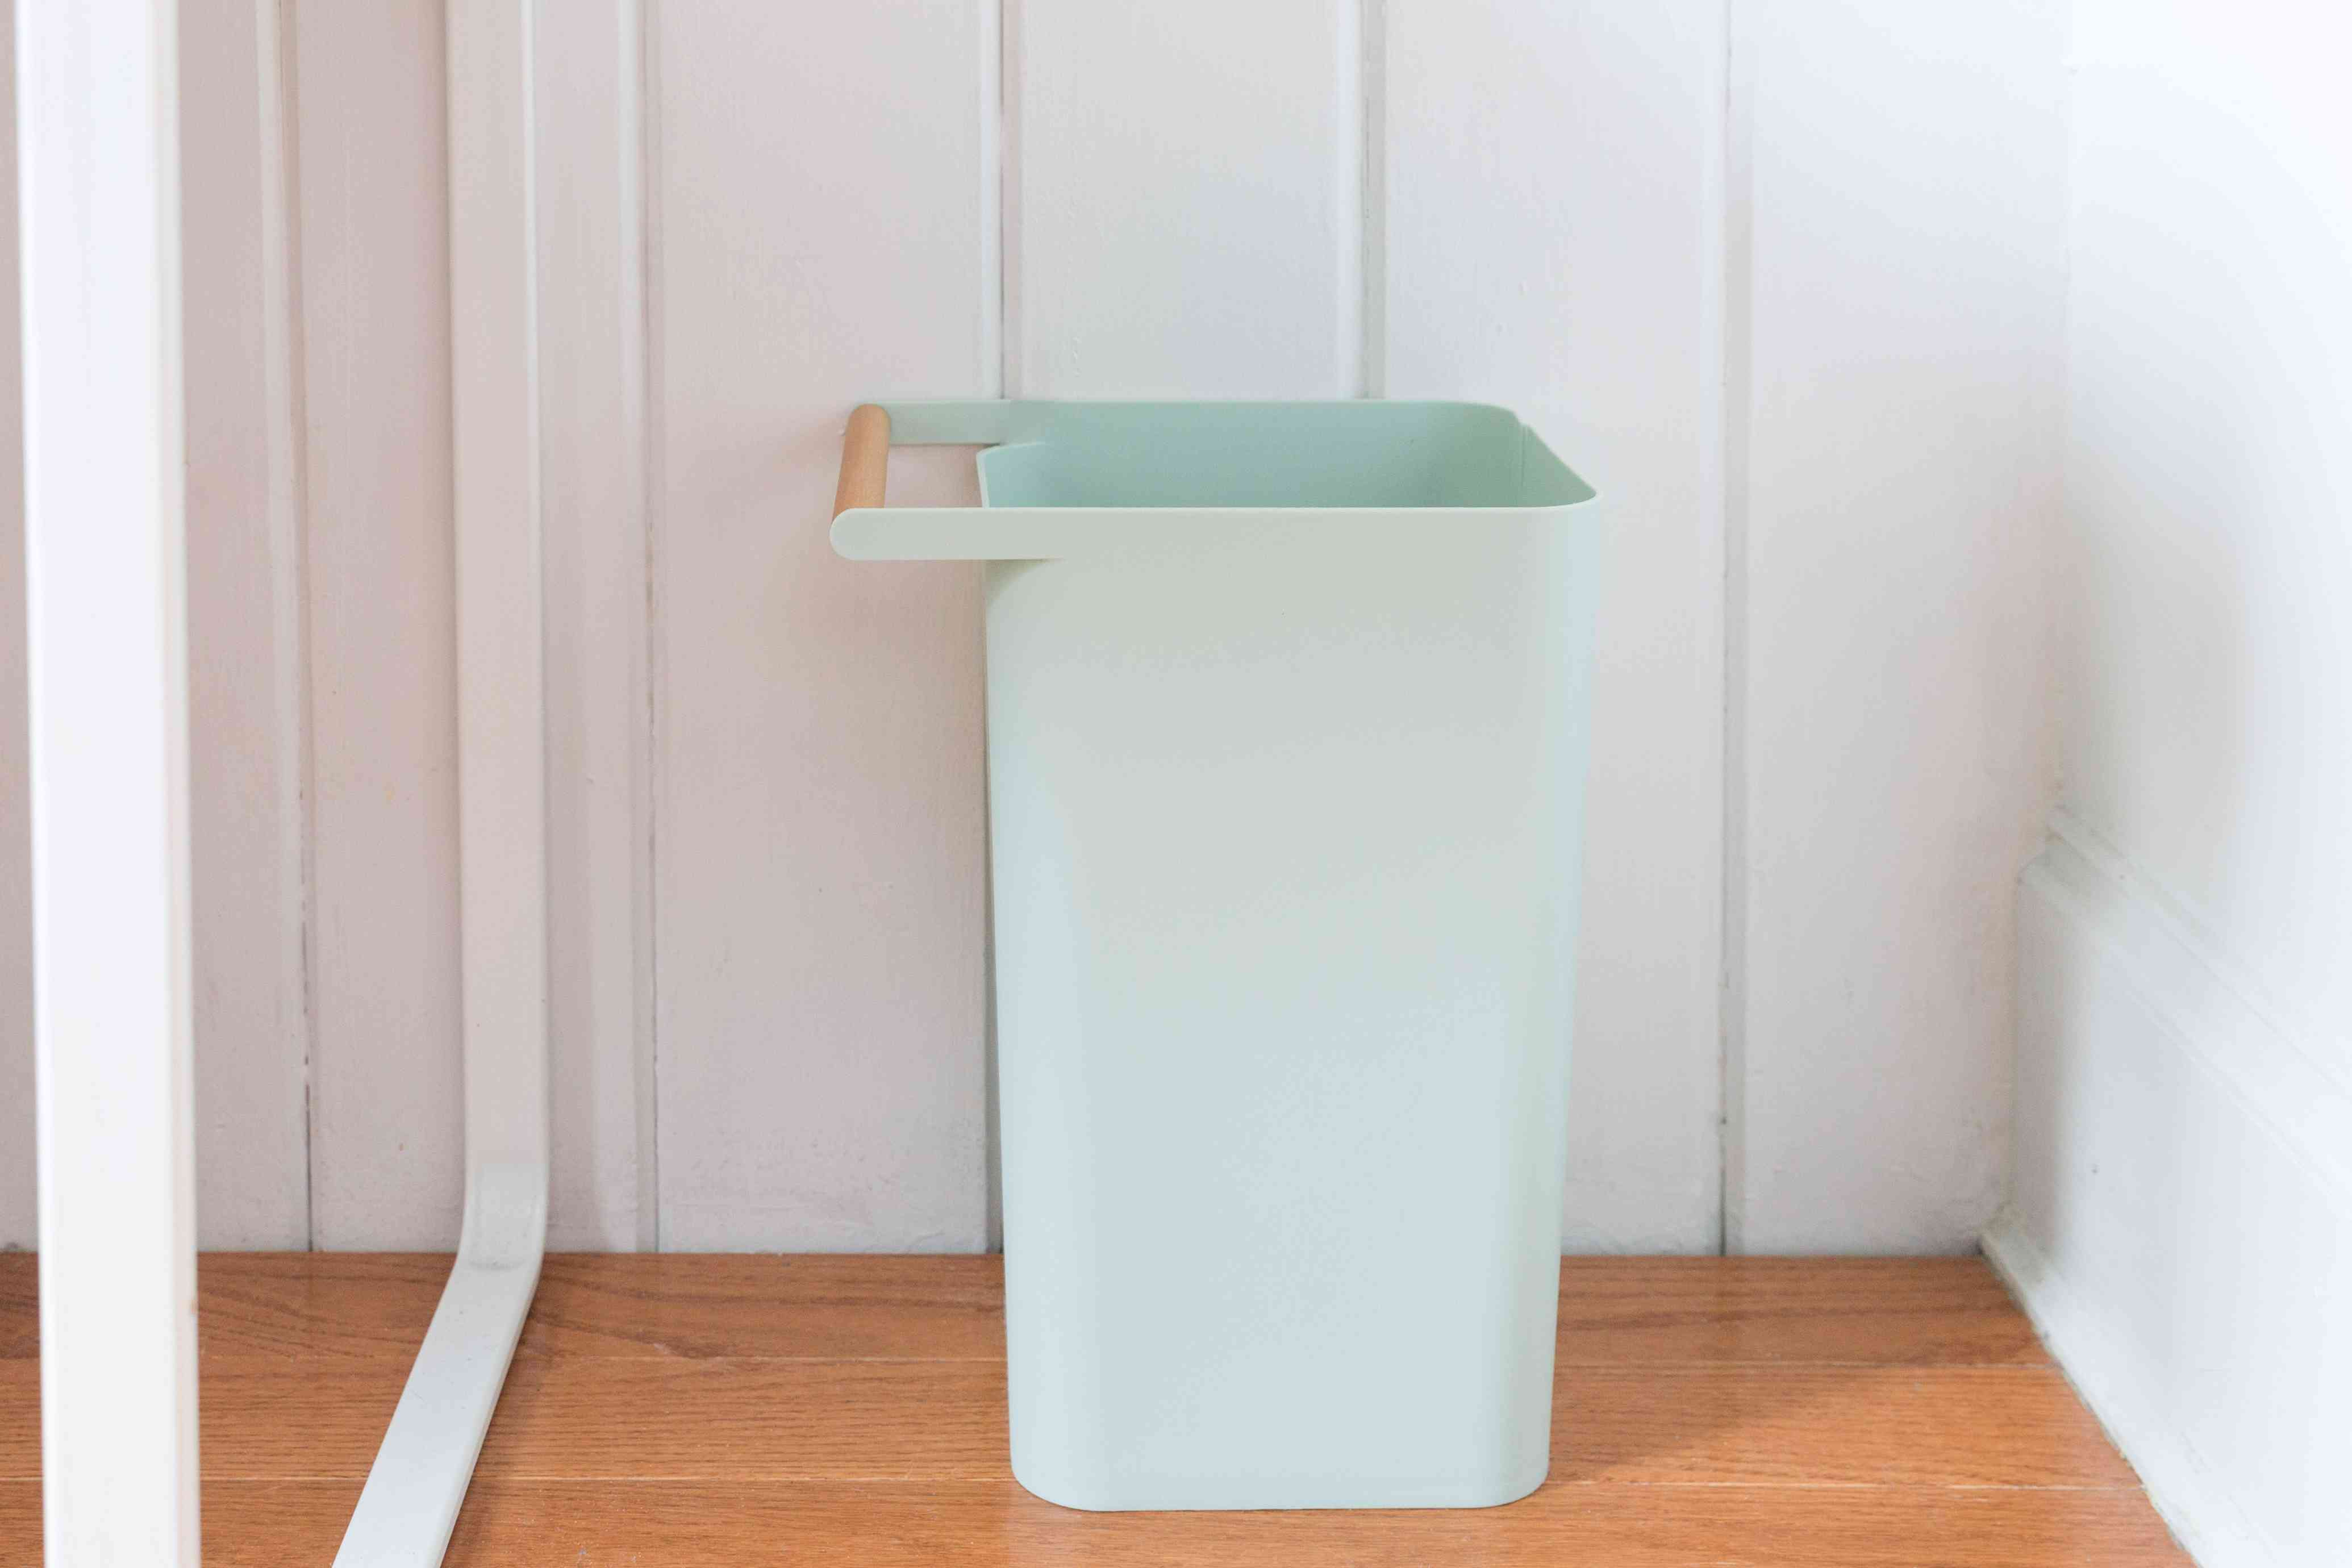 trashcan next to a desk